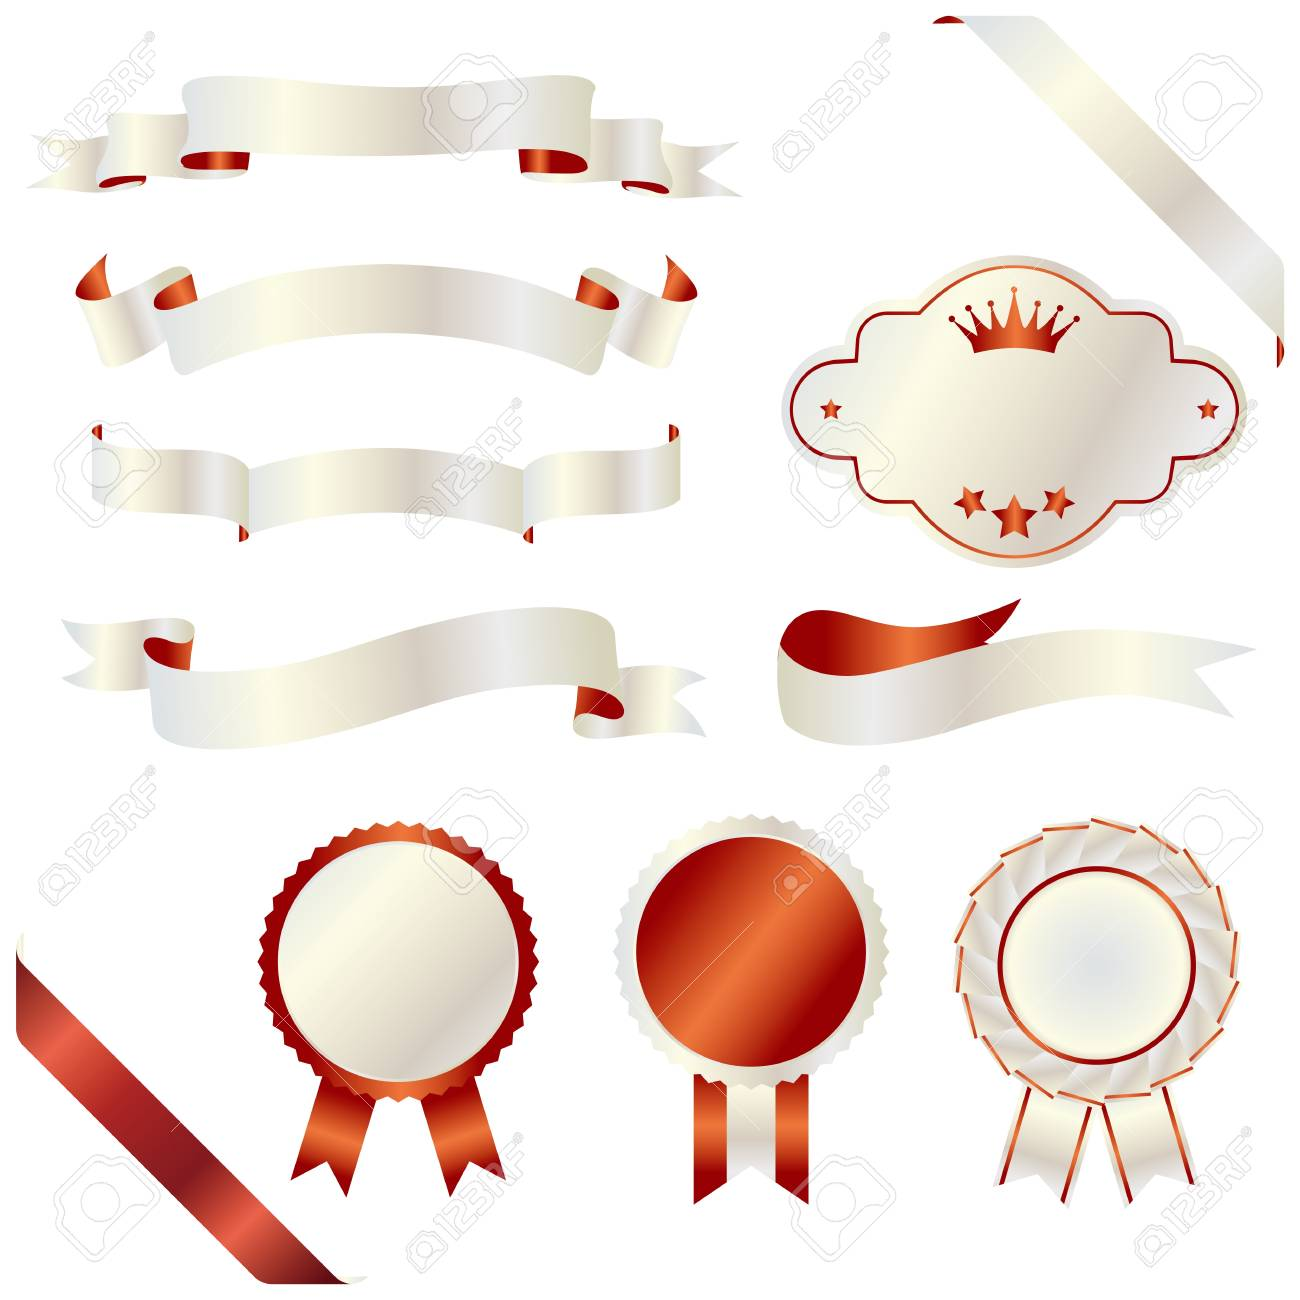 ribbon and emblem Stock Vector - 11882715